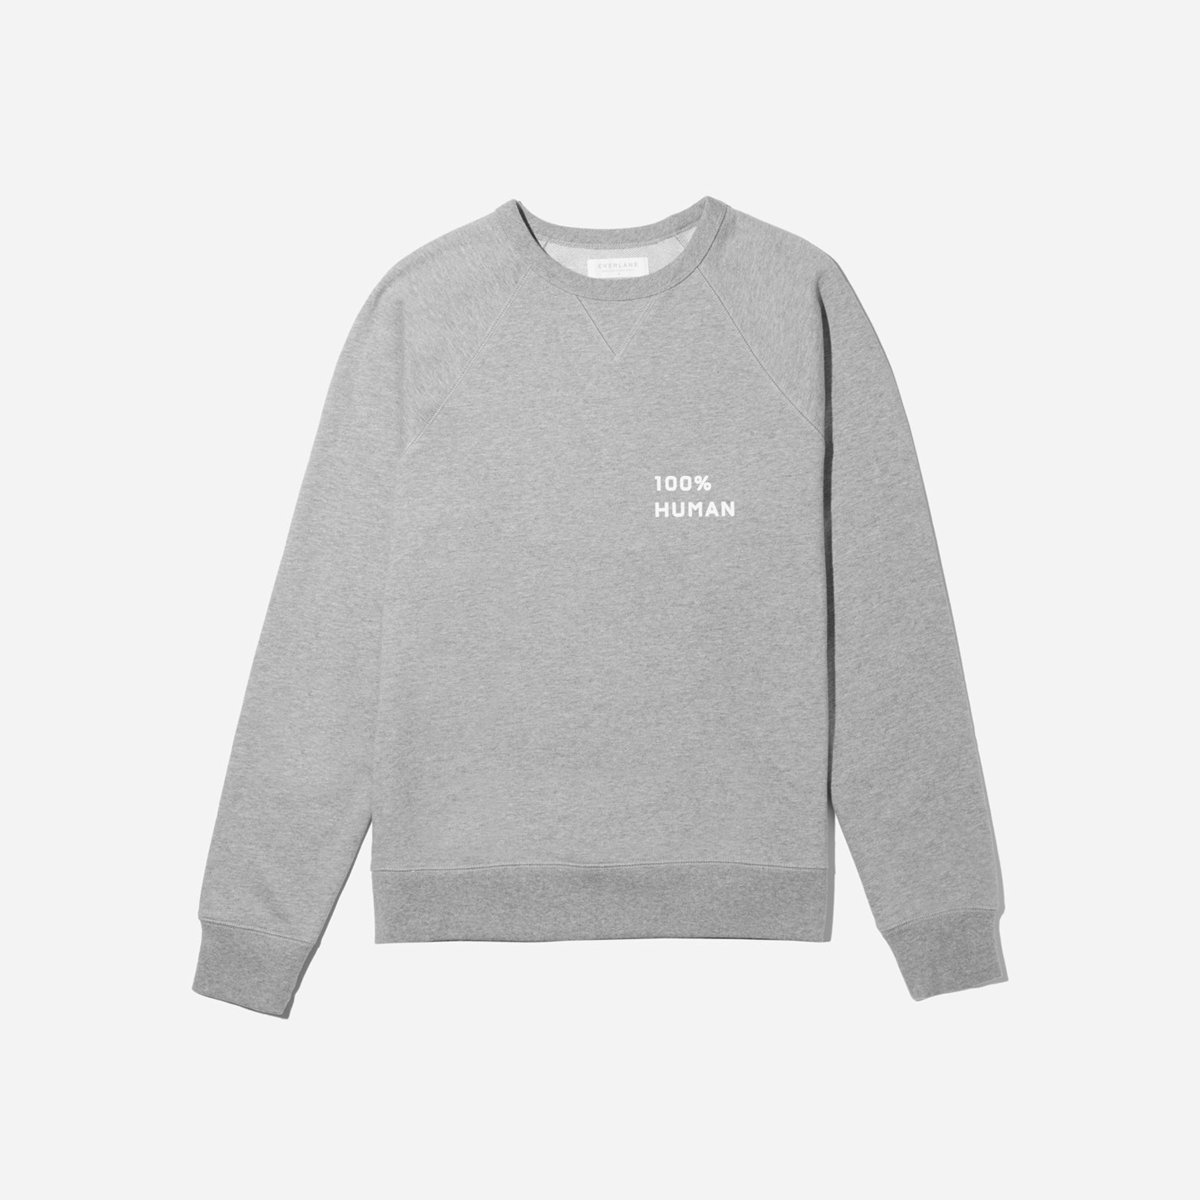 Unisex French Terry Sweatshirt Small Print  $50